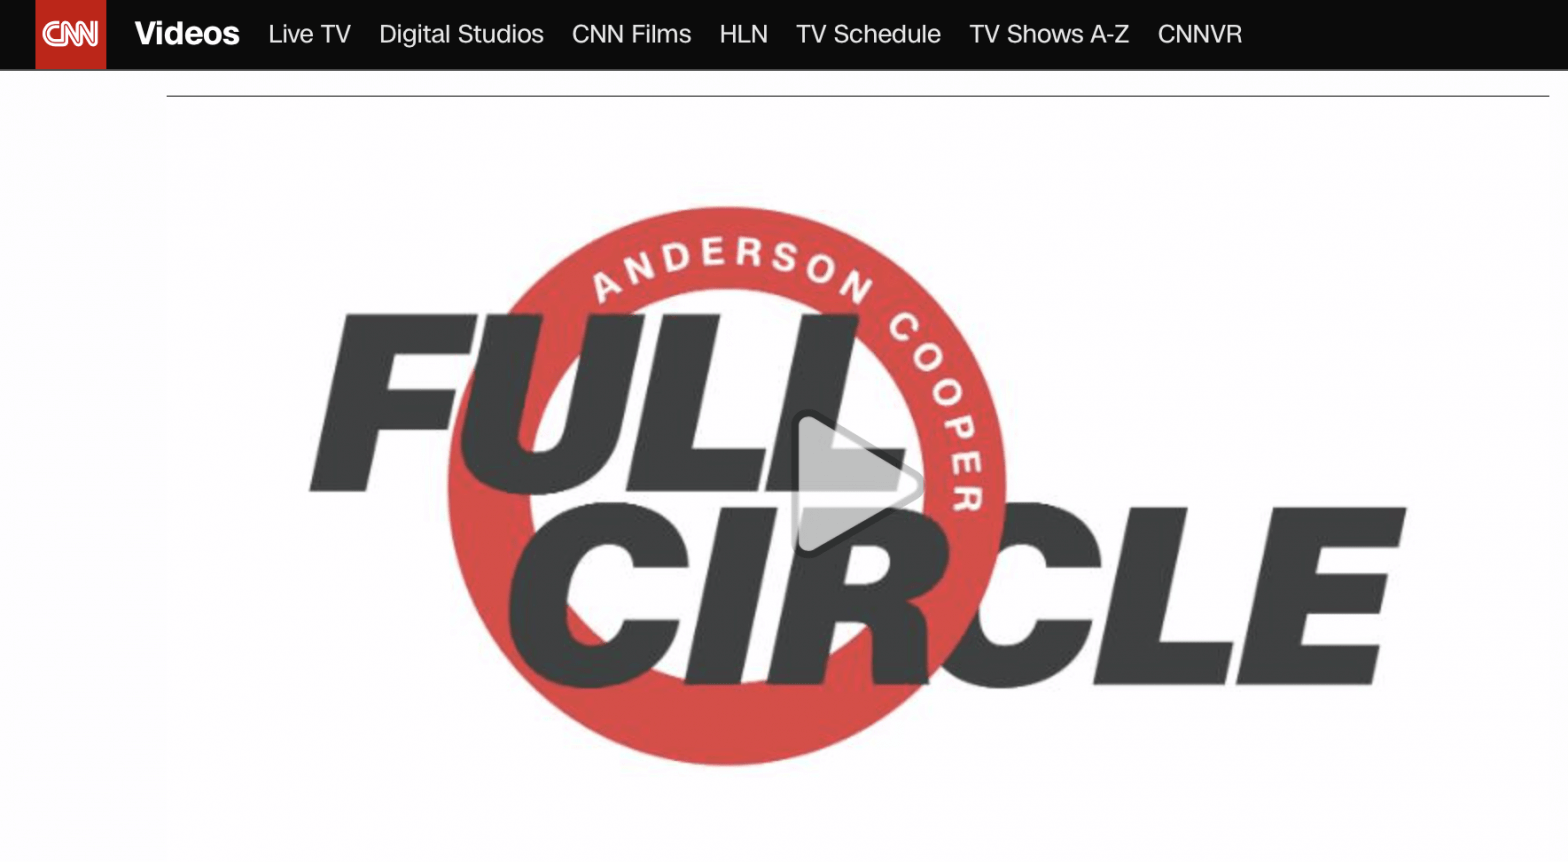 Anderson Cooper Full Circle Promo